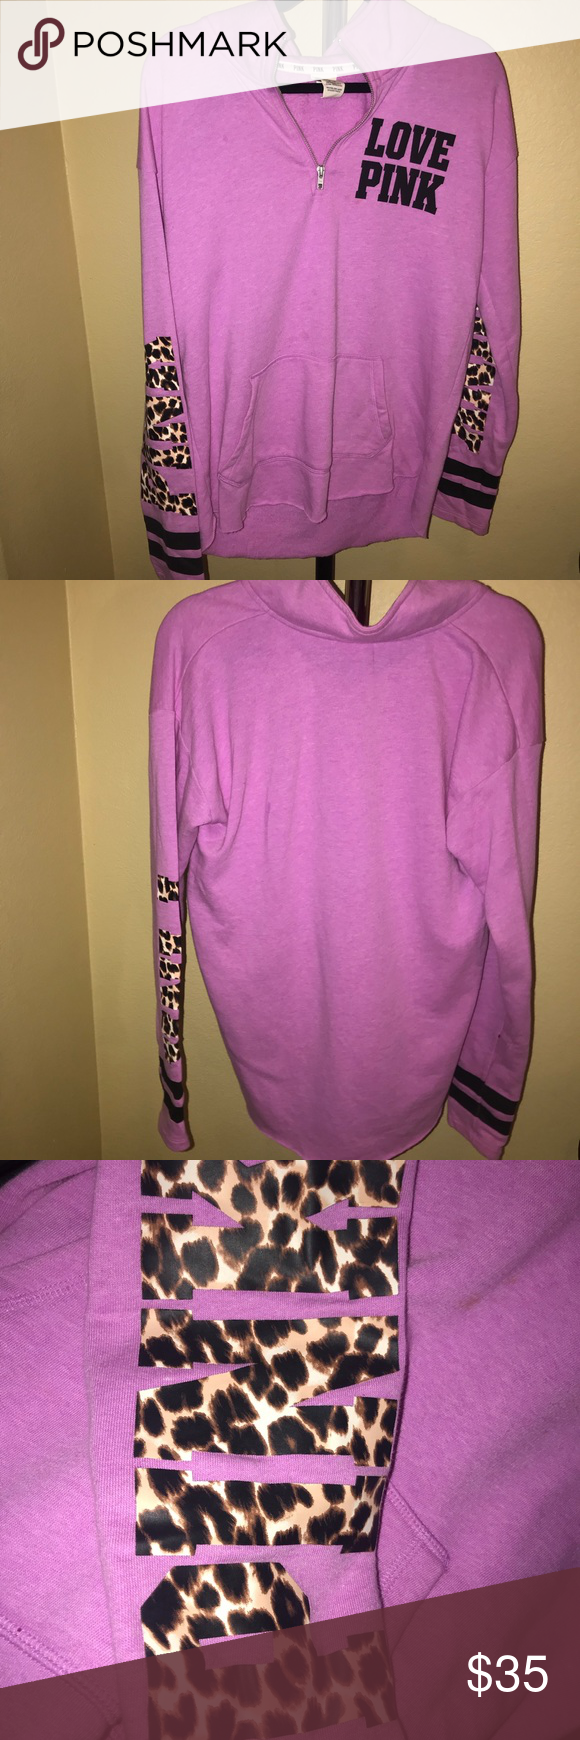 82bf4003c5e31 Pink Victoria Secret Cheetah Shirt | Azərbaycan Dillər Universiteti